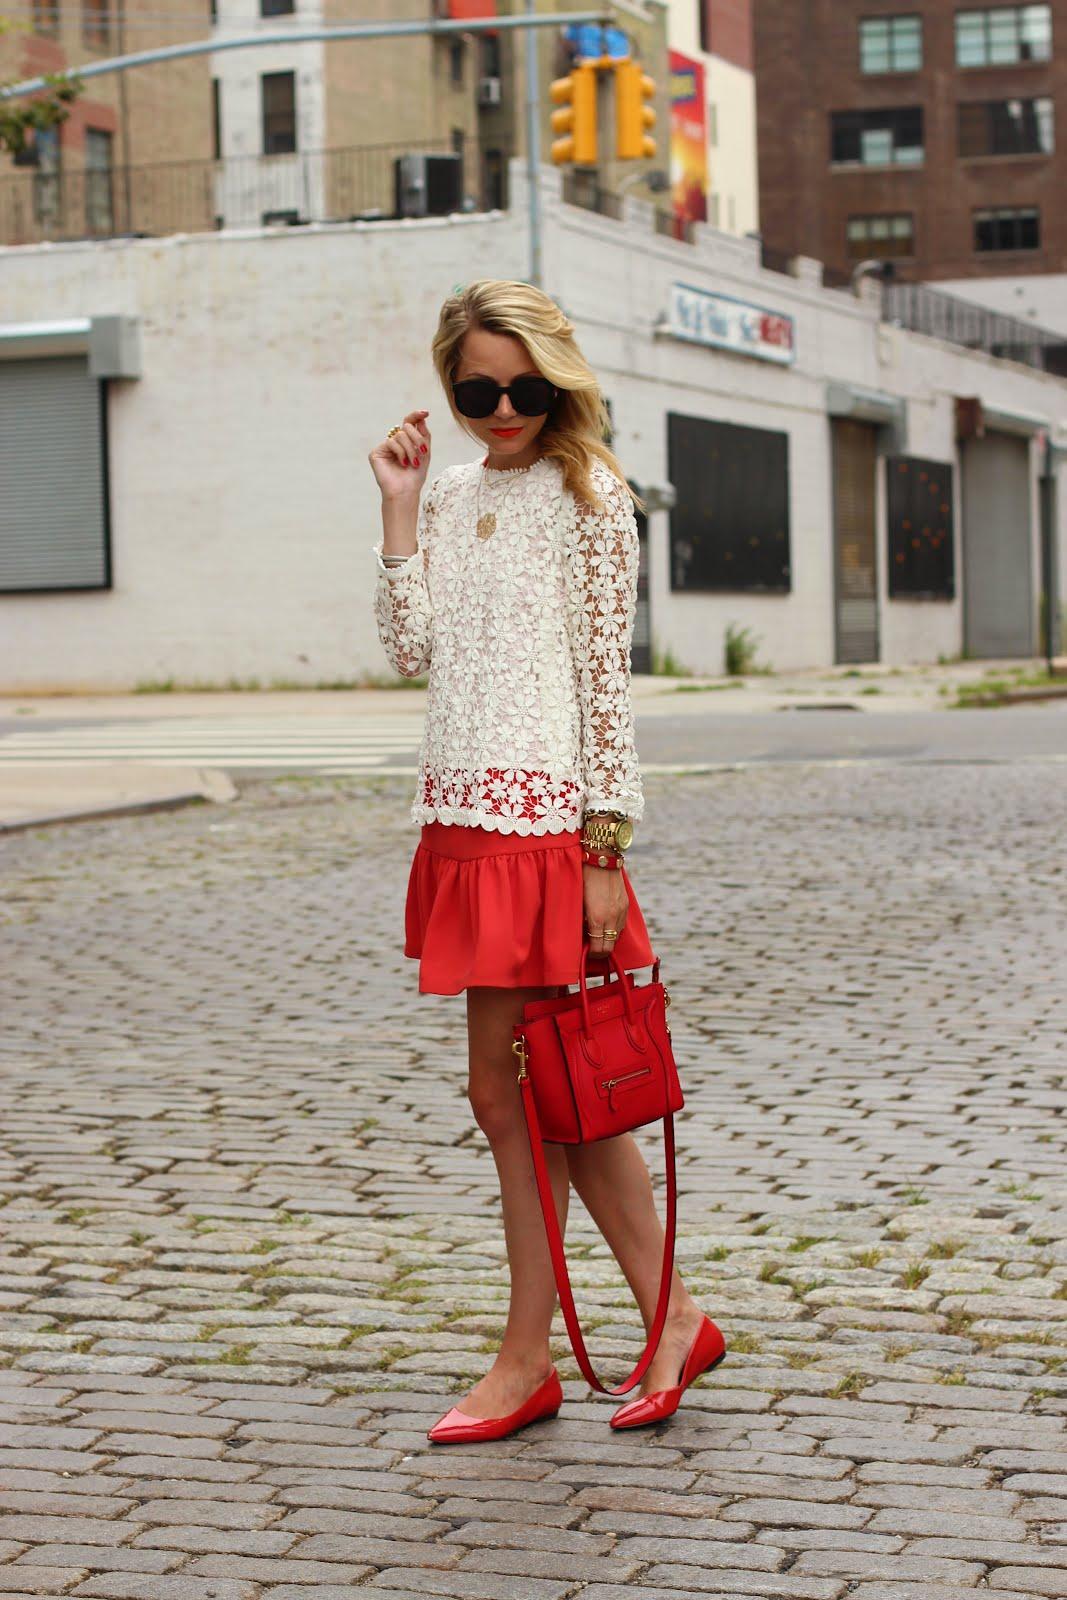 Стиль 90-х и красная мини-юбка.